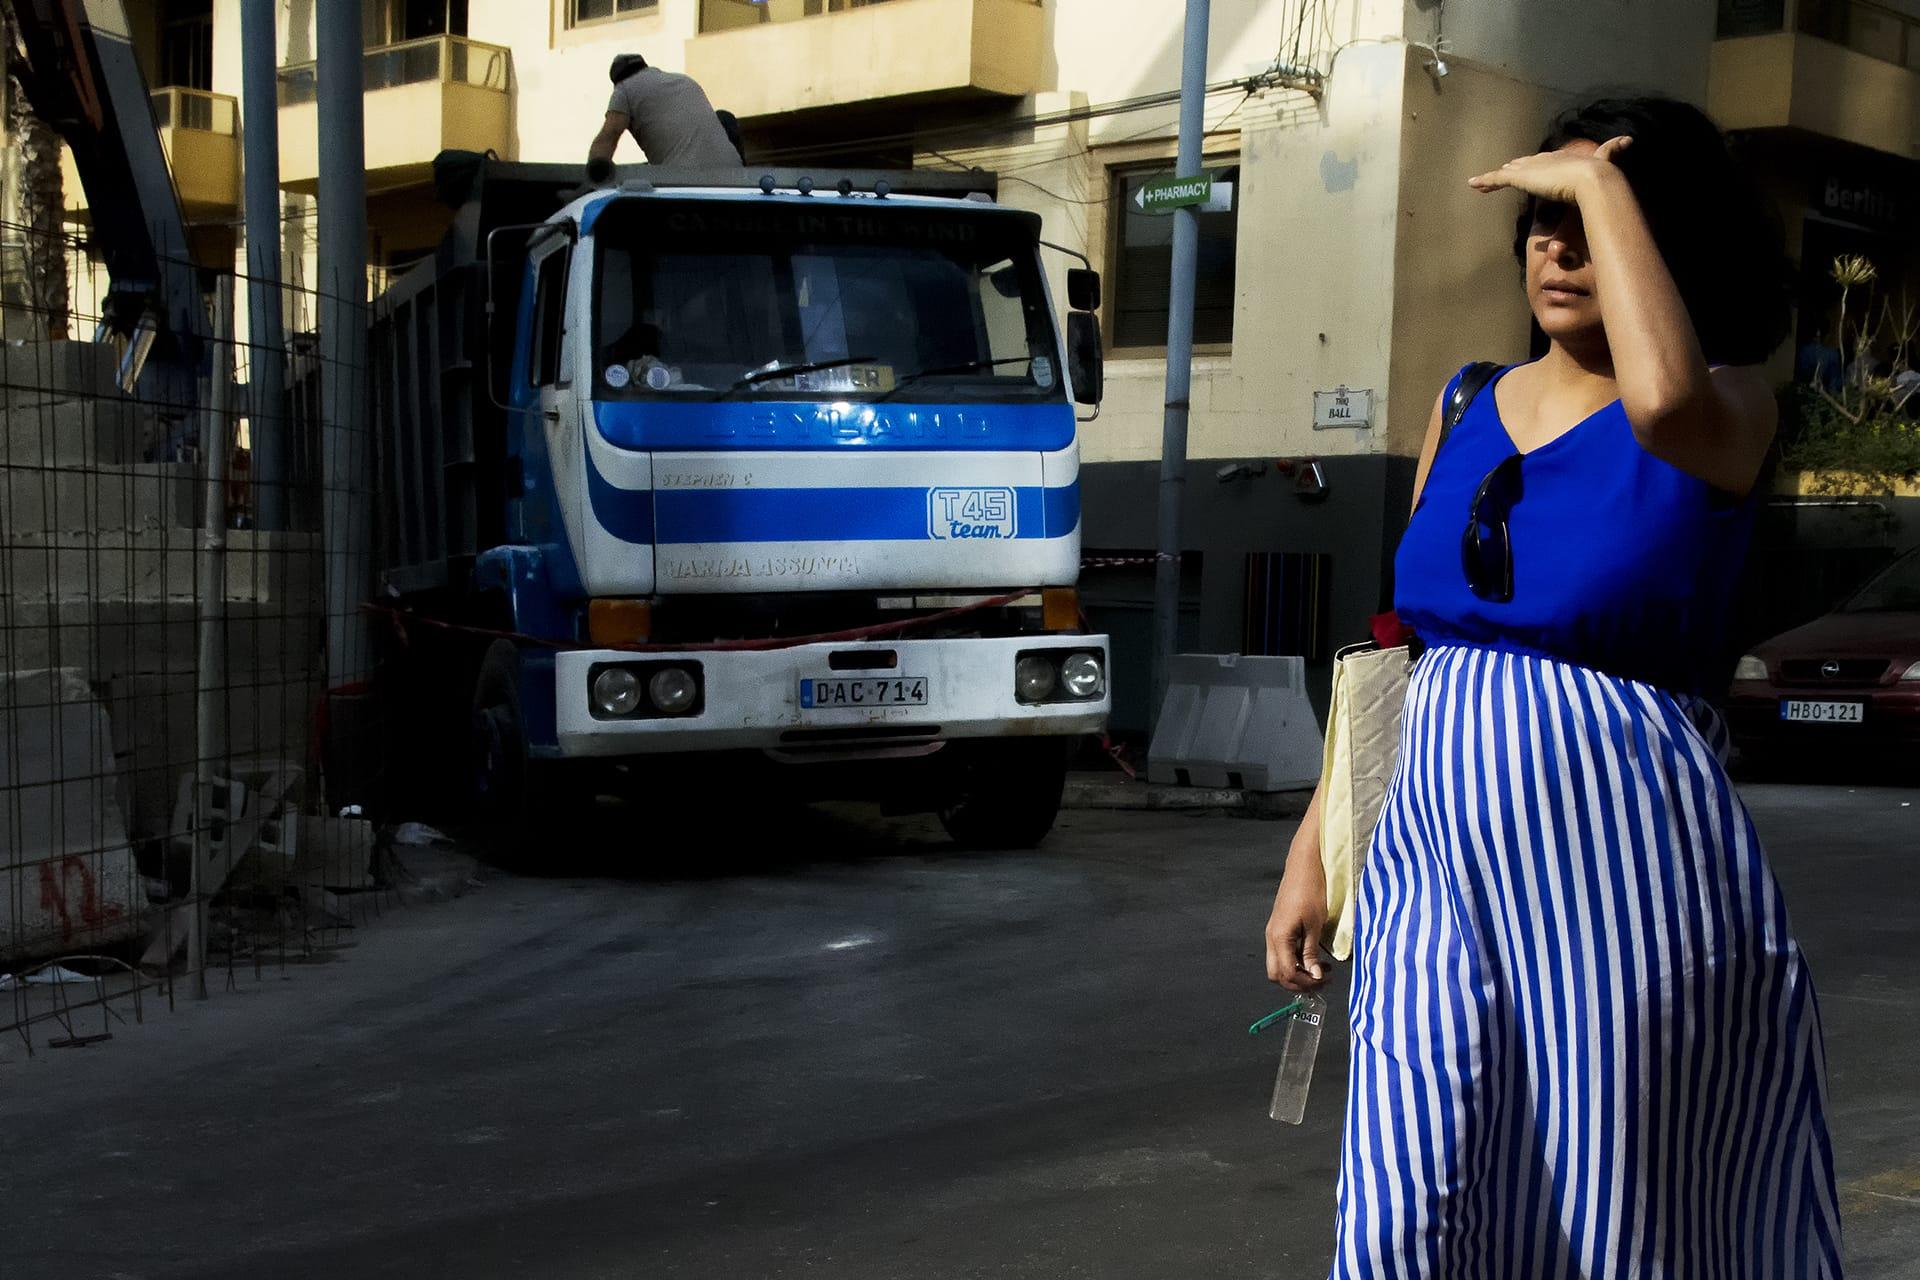 """The Colour Blue"" street photograph by David Mar QUinto"